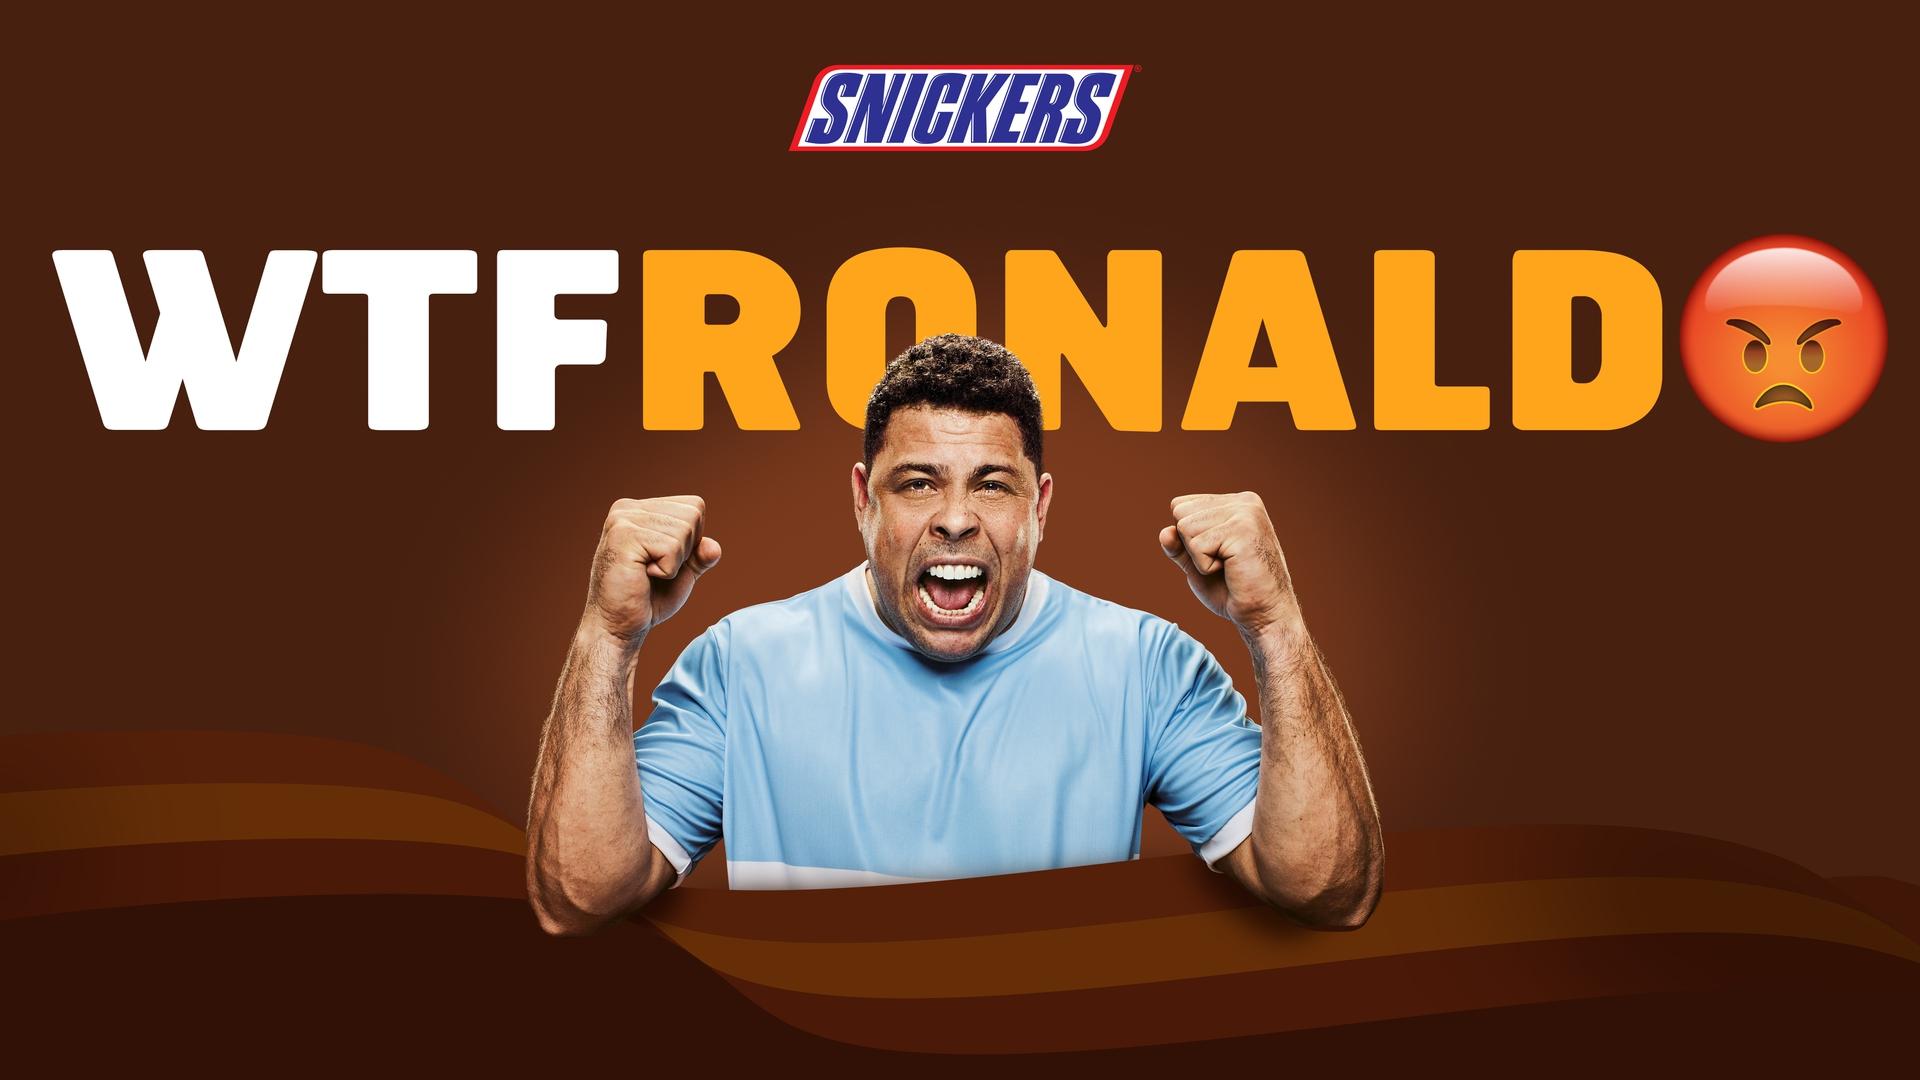 ¿¡WTF Ronaldo!?